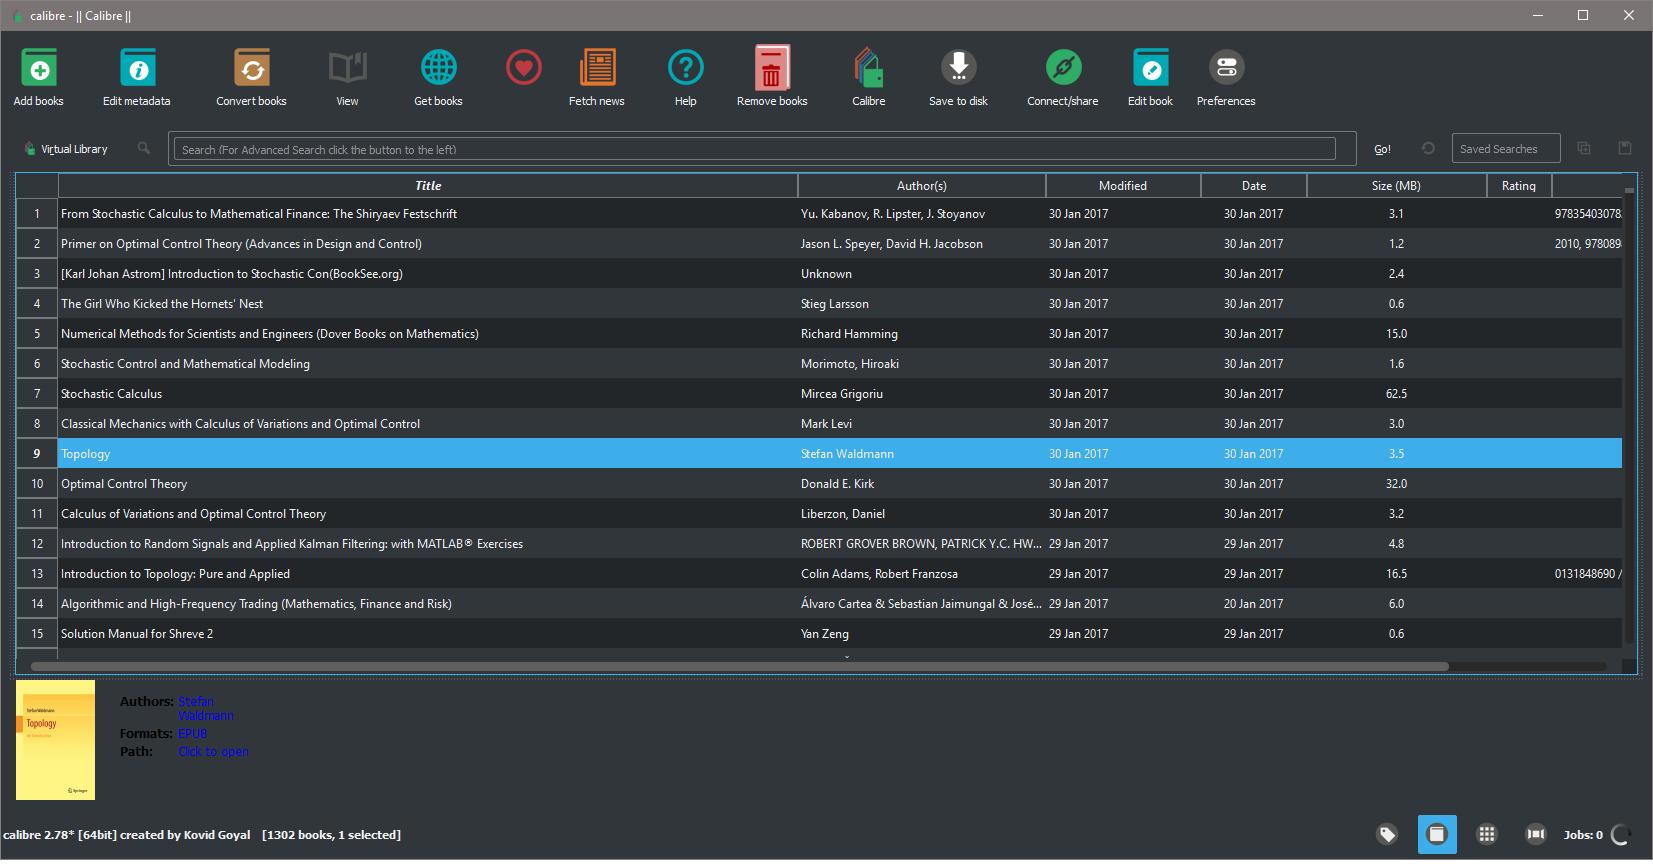 Dark theme in Calibre for Windows 10 - MobileRead Forums